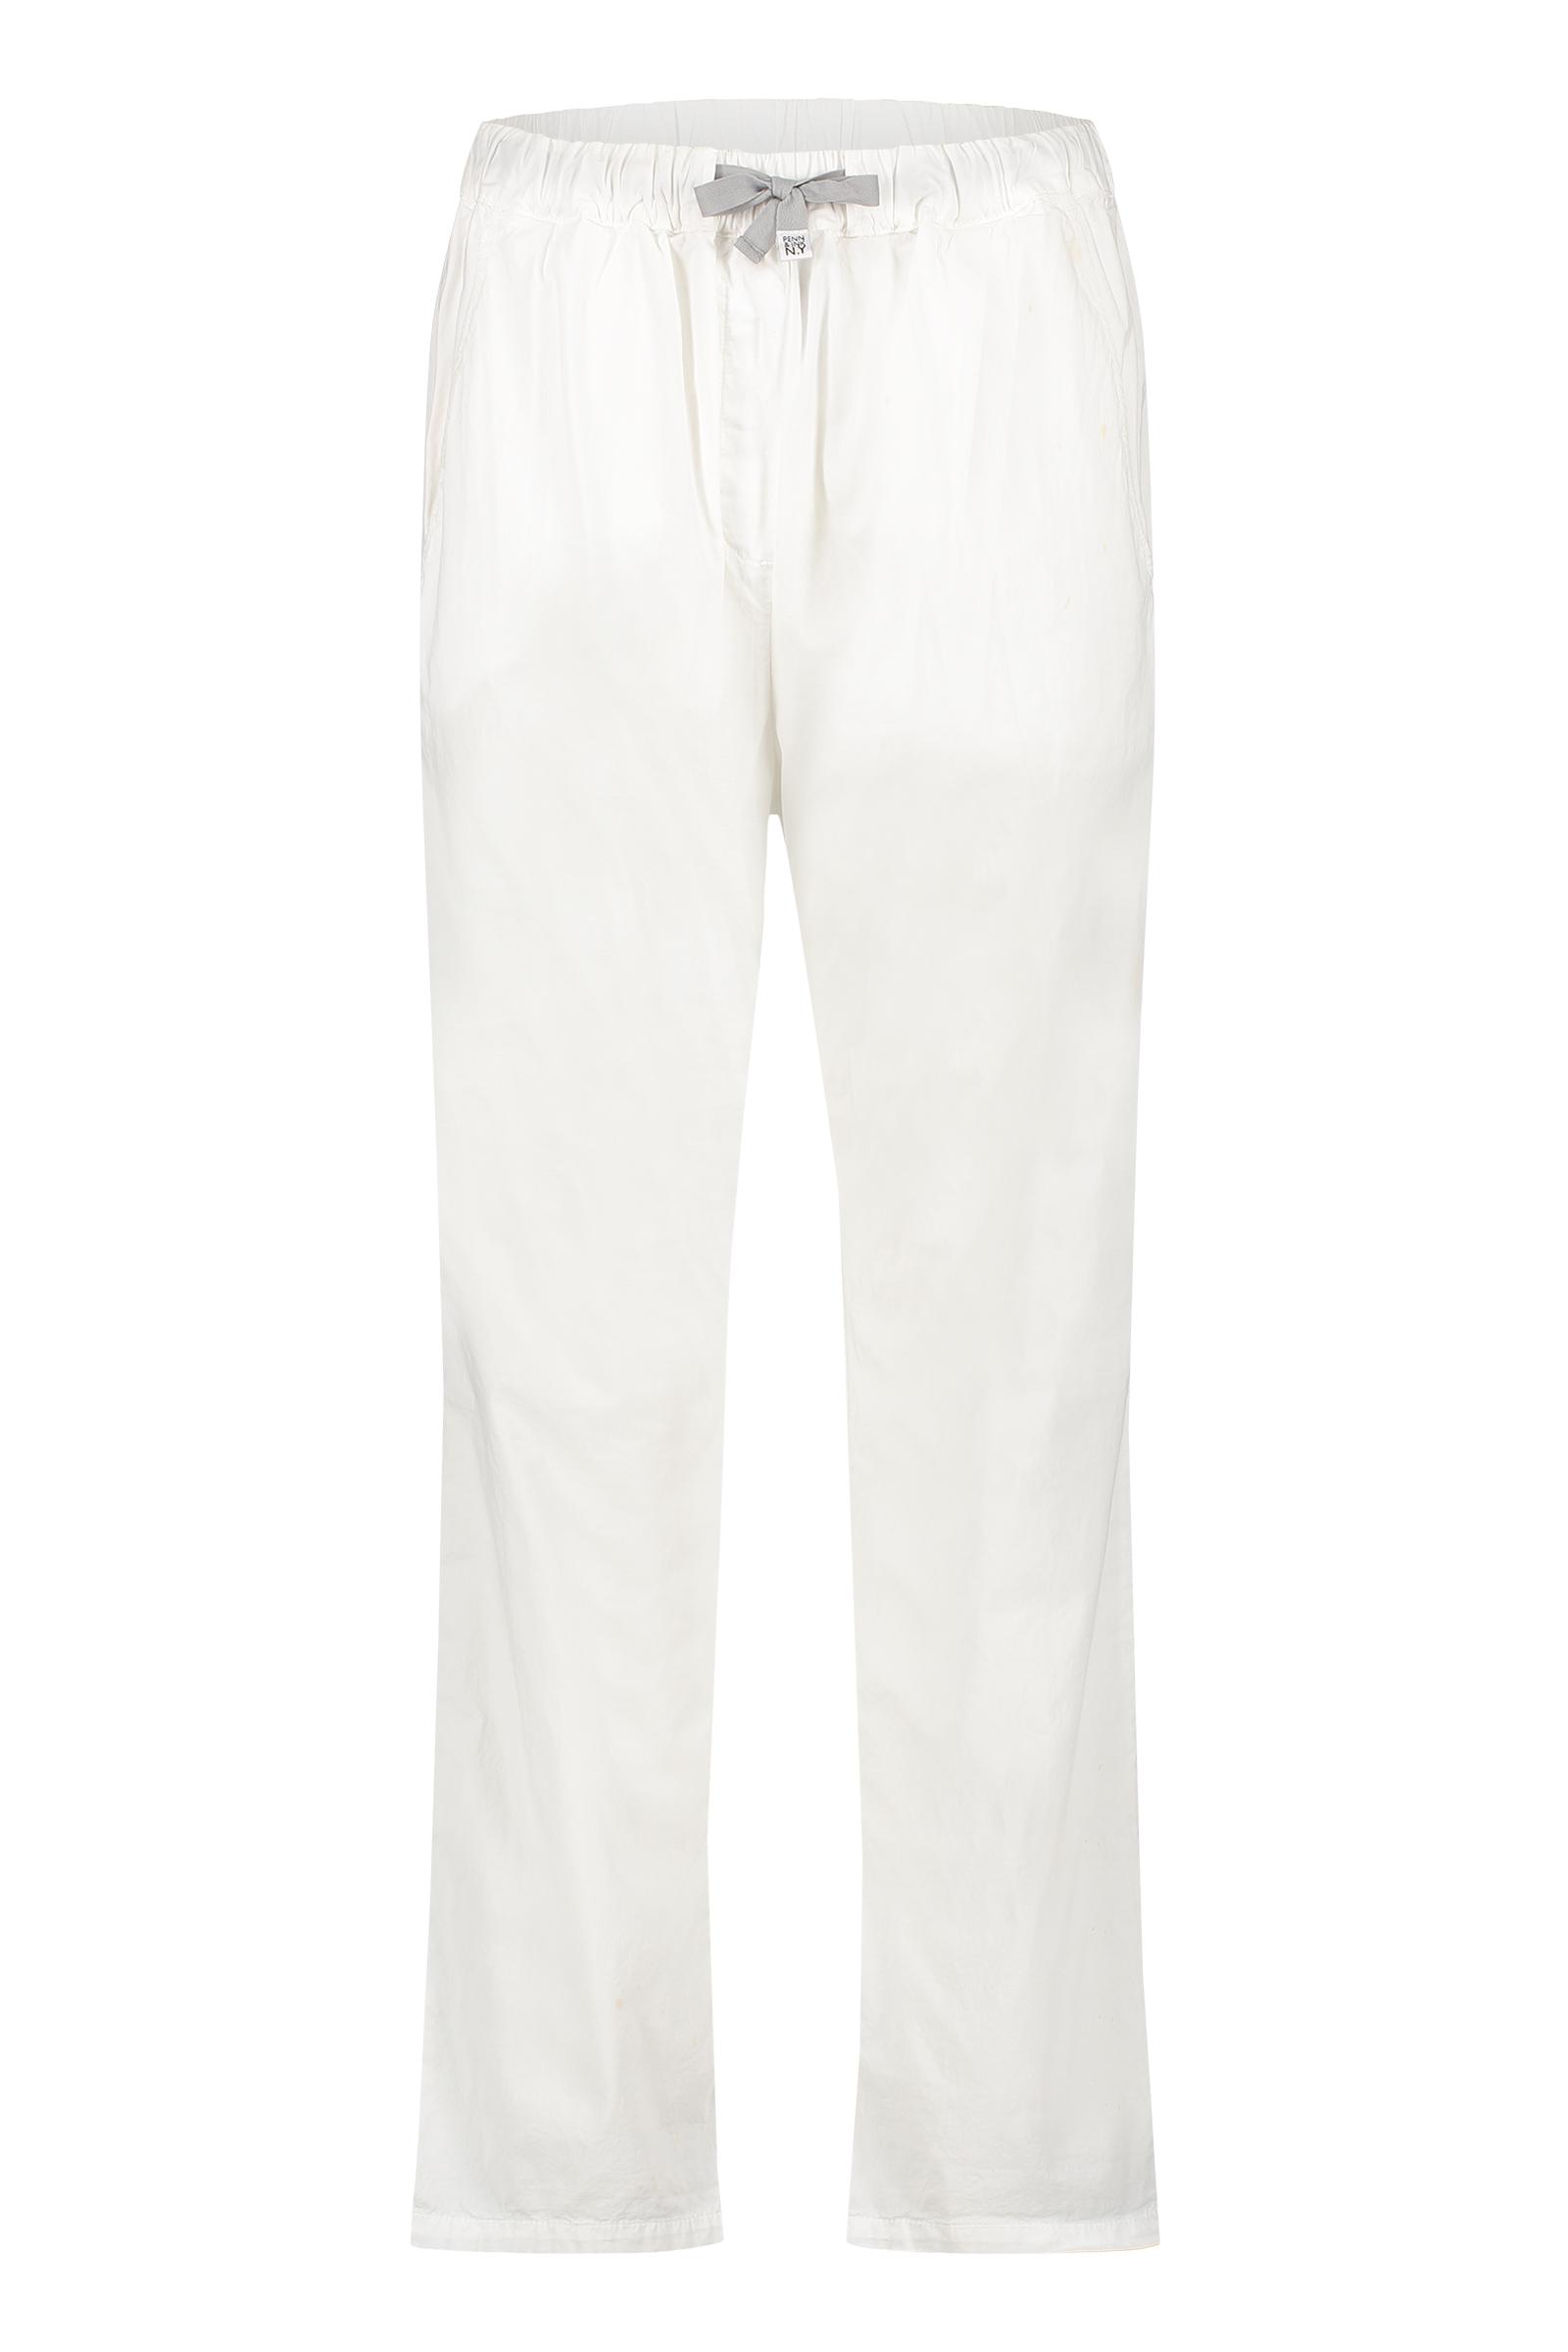 Witte dames broek - Penn&Ink - S21W317 - white